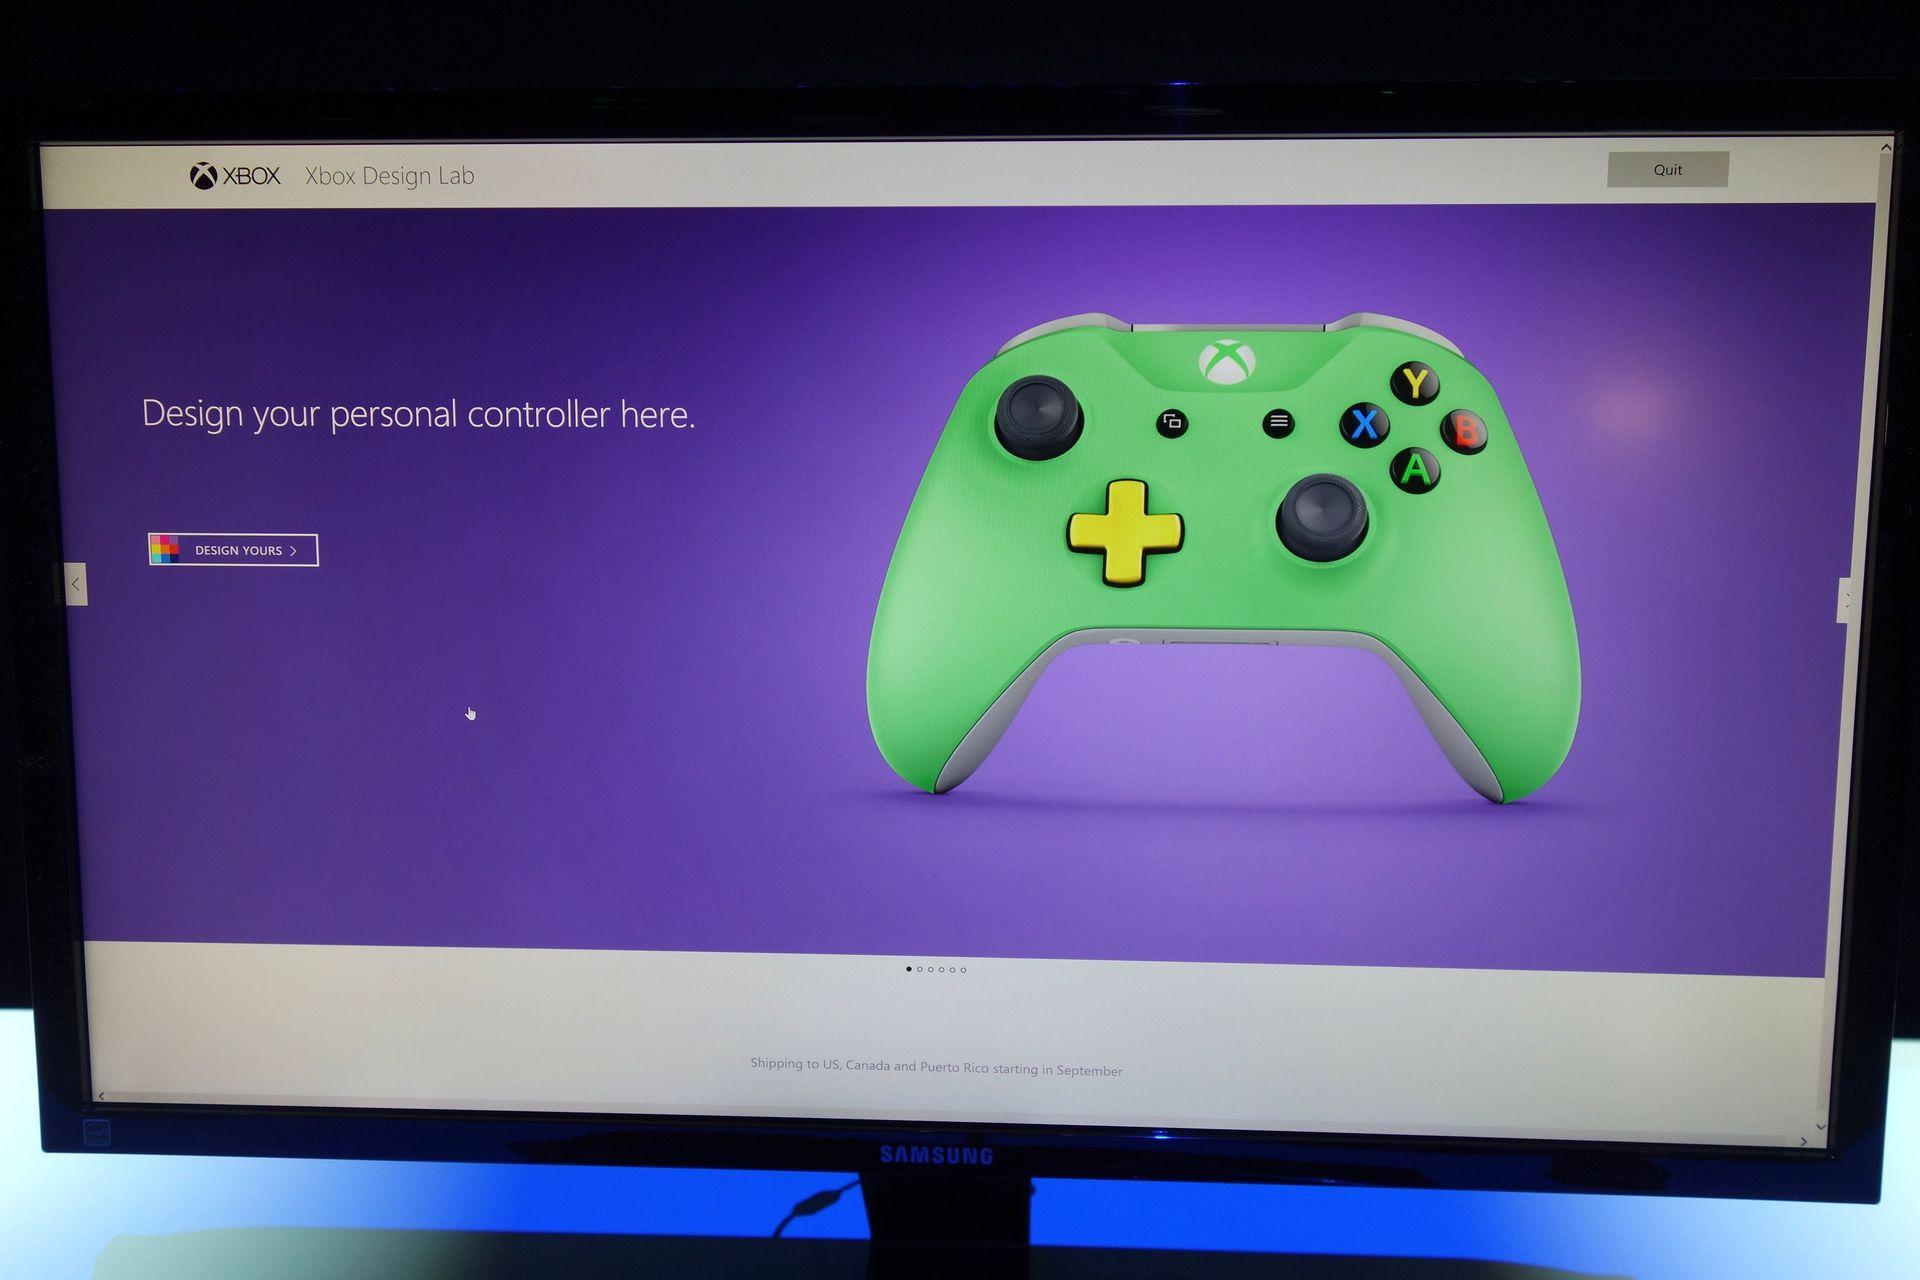 Xbox Design LabであなただけのNew Xbox Wireless Controllerがデザインできる